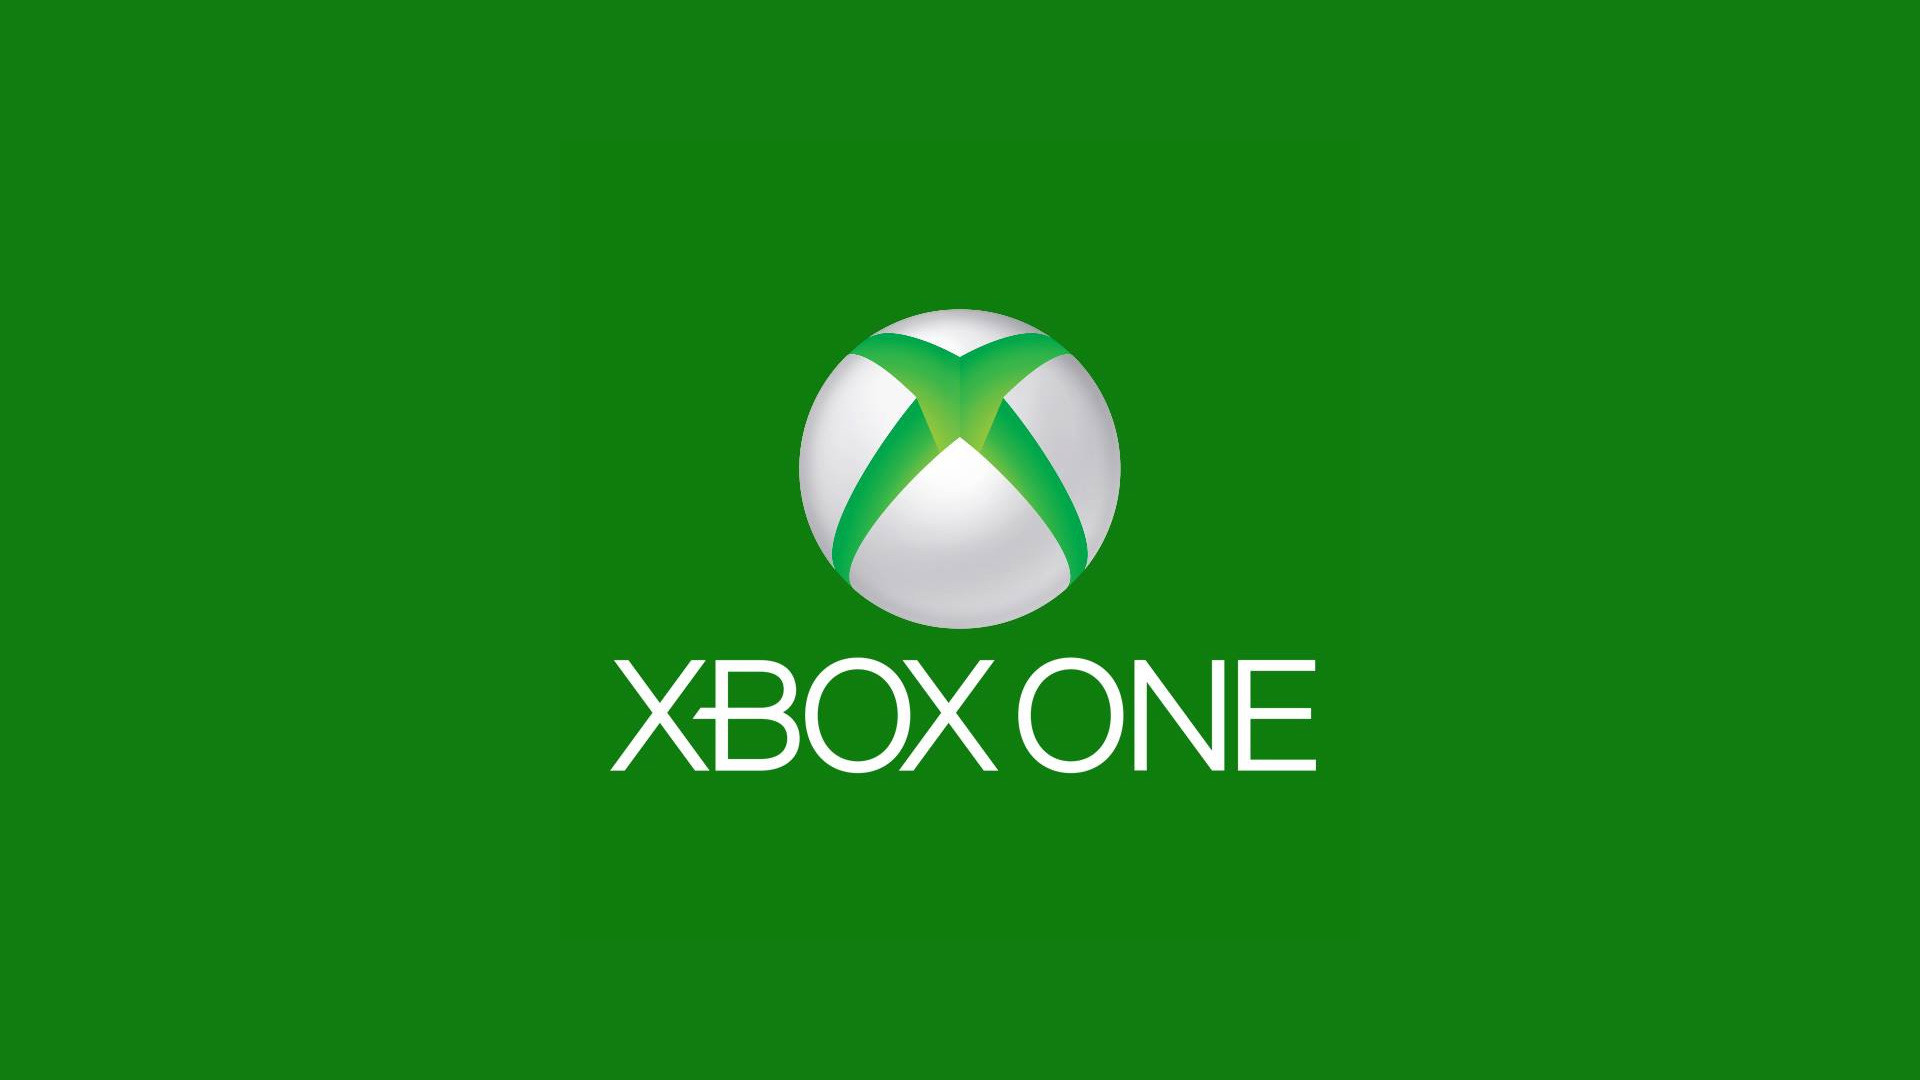 Xbox One Logo 1080p Wallpaper …